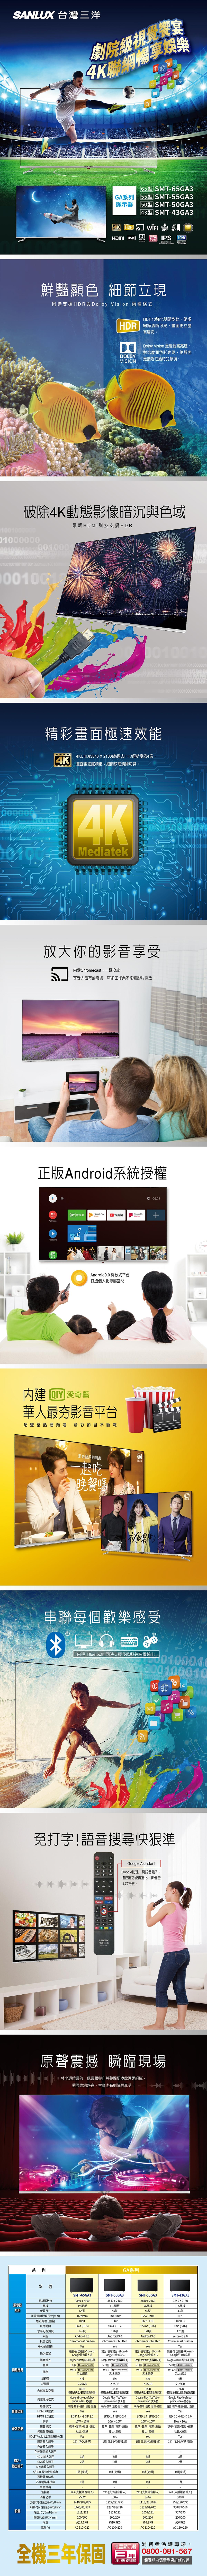 SANLUX台灣三洋50吋4K HDR連網電視 SMT-50GA3 另有 SMT-55GA3 SMT-65KU1